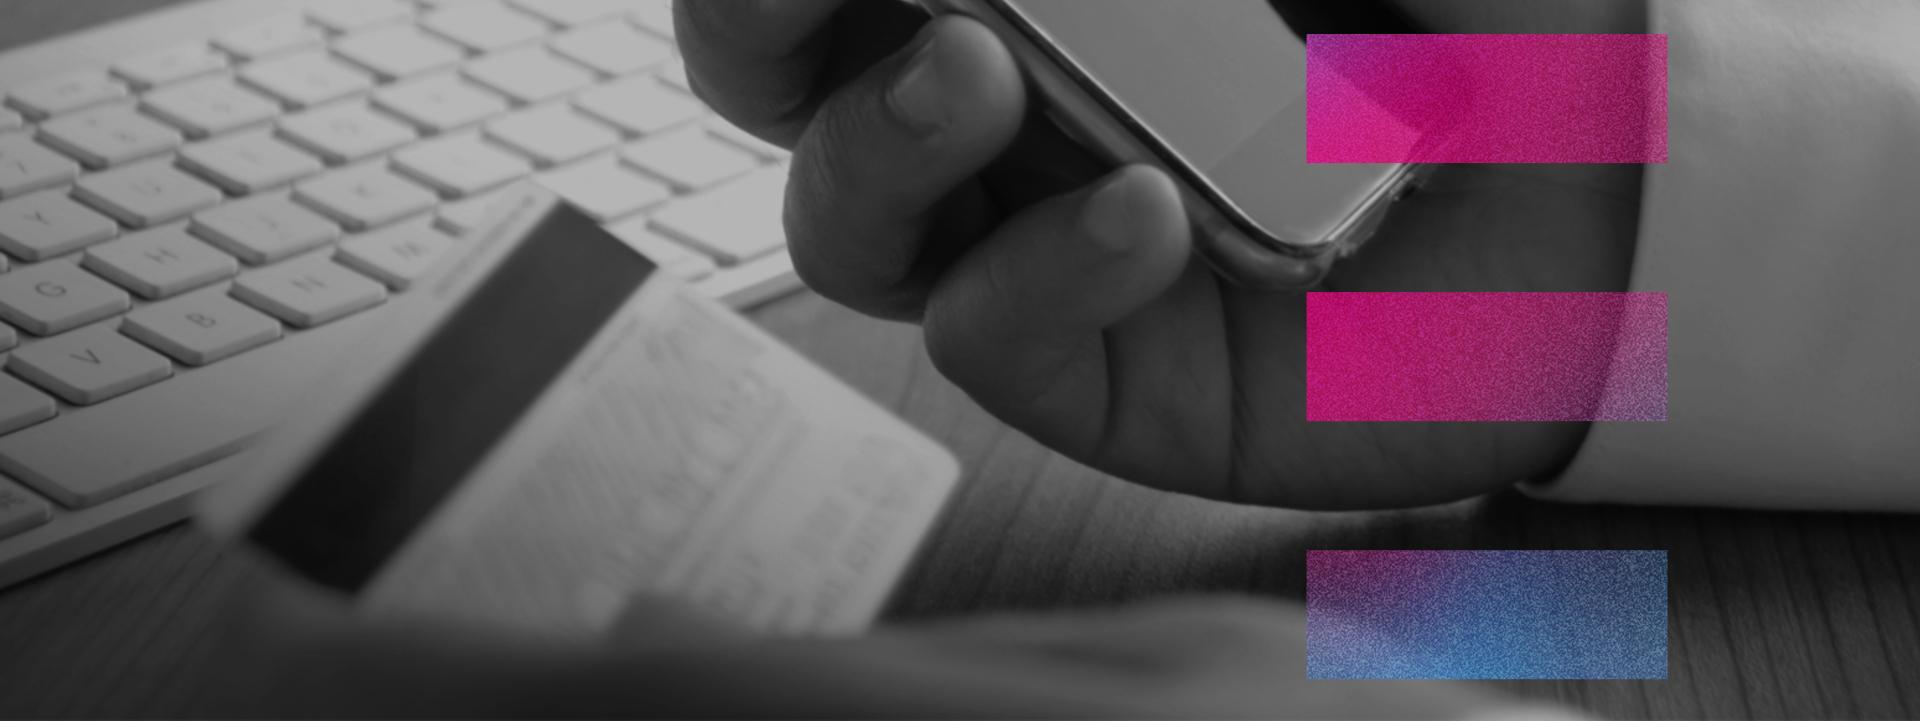 Mobik-header-services-mobile-data